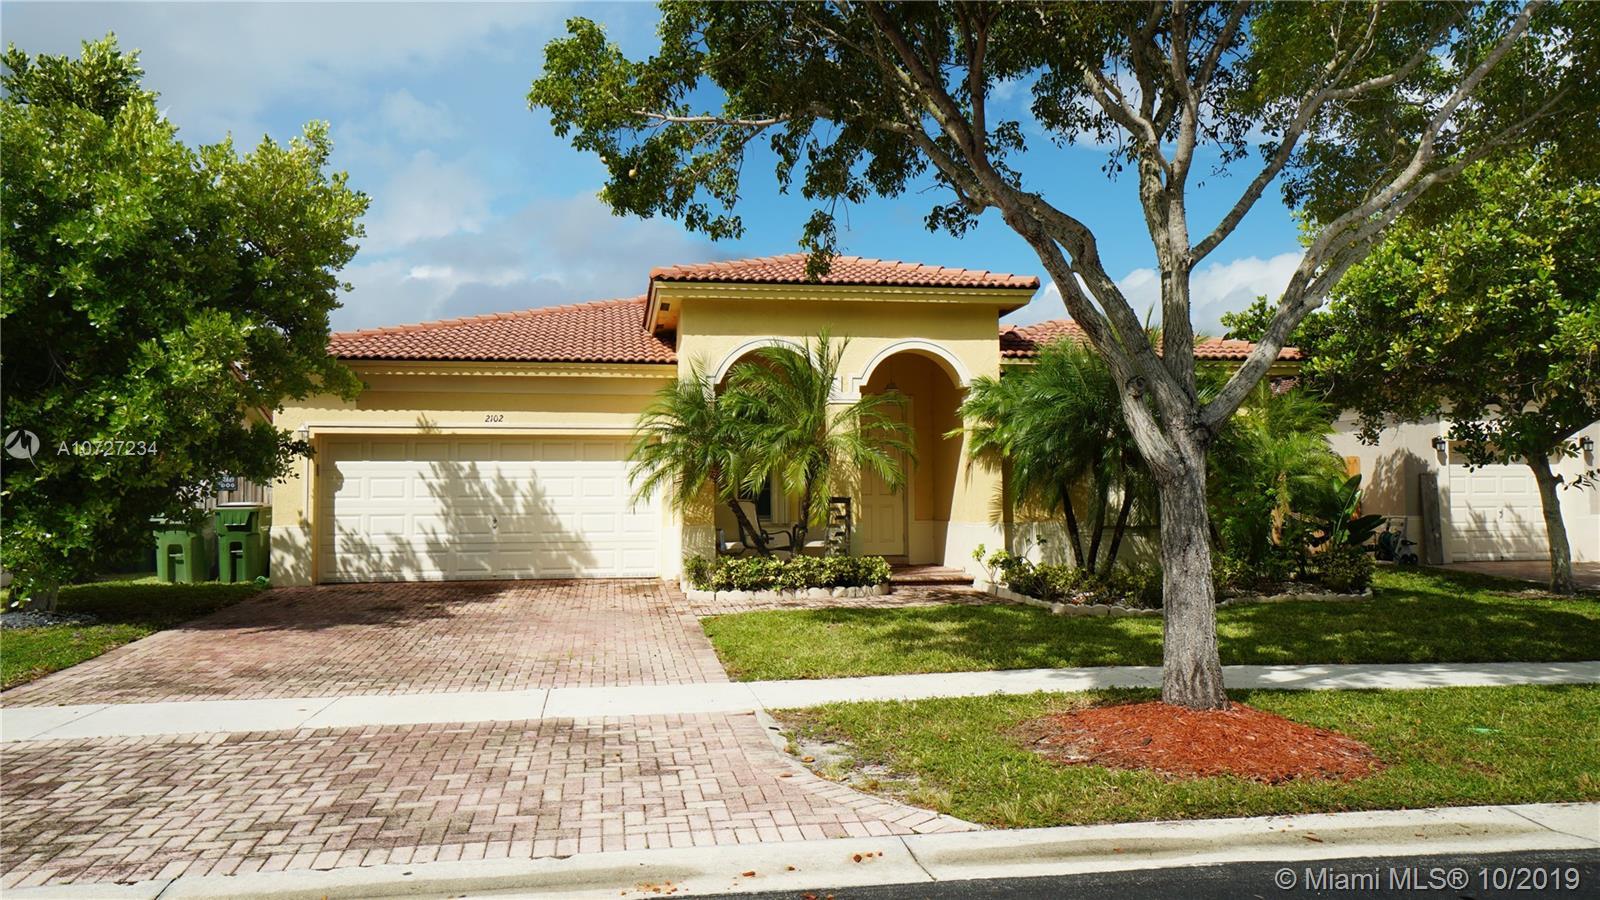 2102 NE 40 AVE, Homestead, FL 33033 - Homestead, FL real estate listing